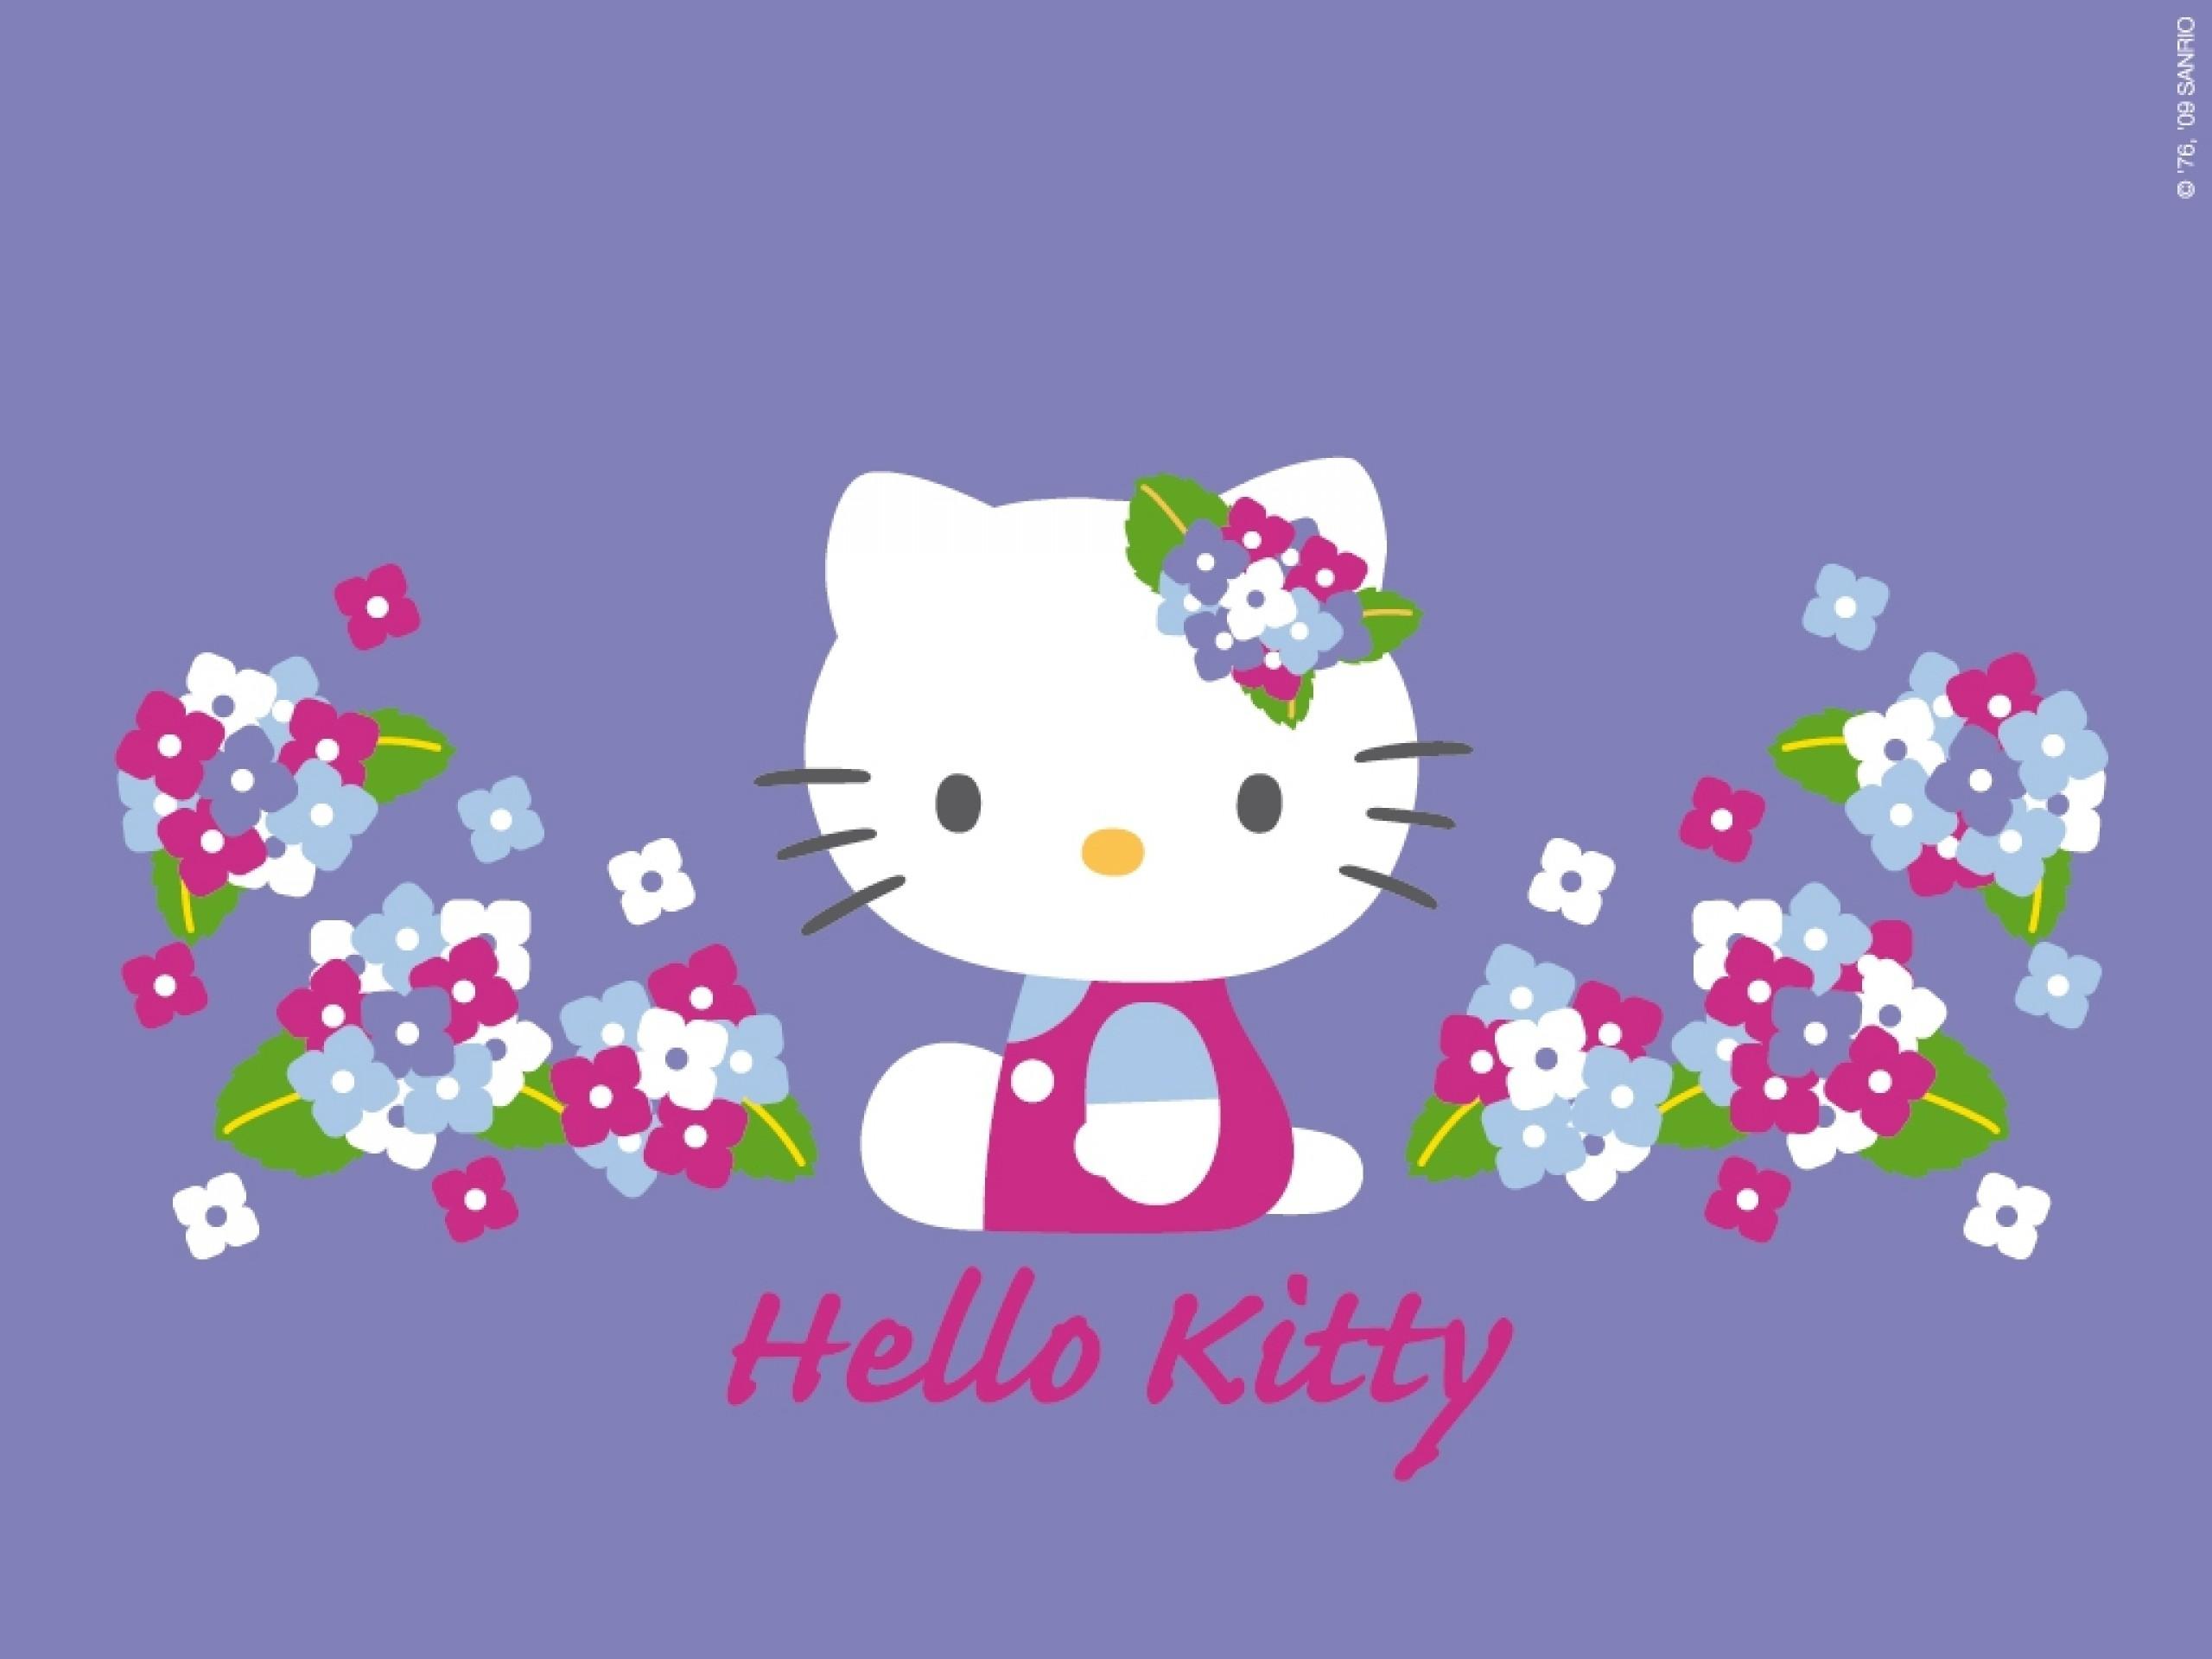 Best Wallpaper Hello Kitty Room - 811067-free-download-hello-kitty-tokidoki-wallpaper-2560x1920-photo  Graphic_964938.jpg